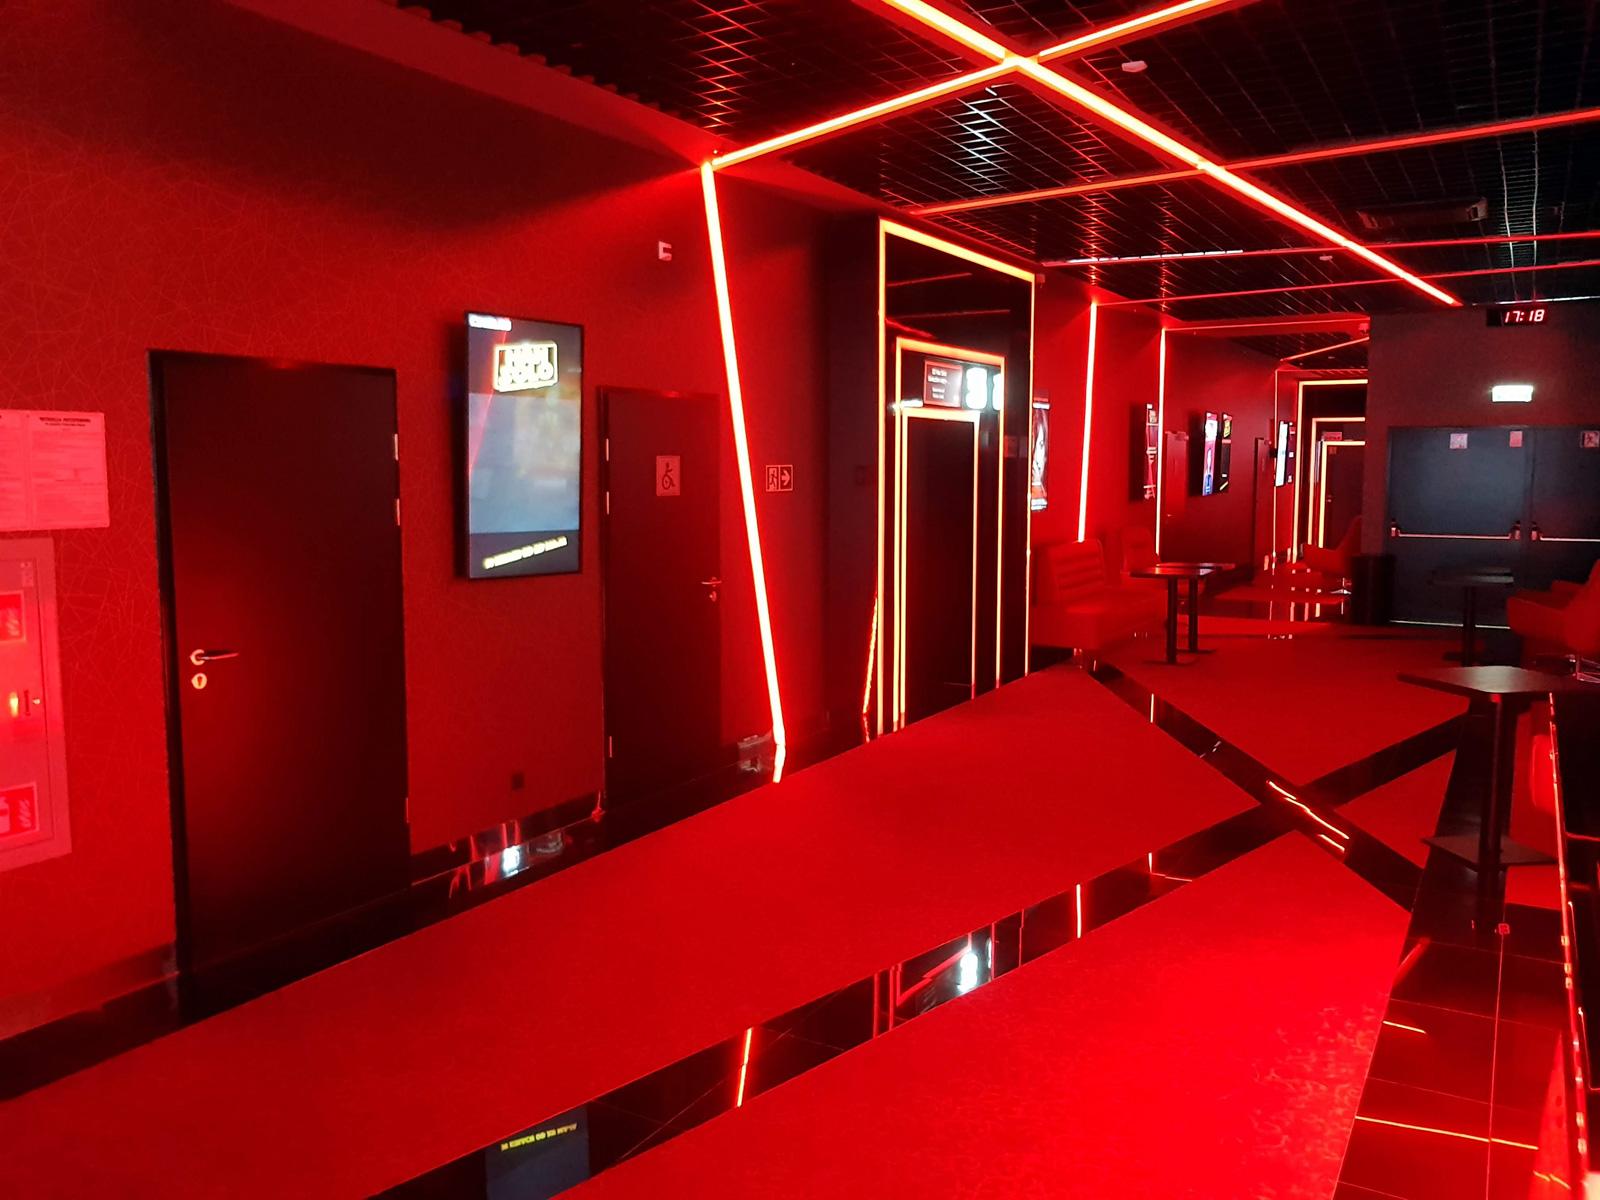 Helios-Forum-Gdansk-Poland-Hallway-Lighting-Patrick-von-Sychowski.jpg